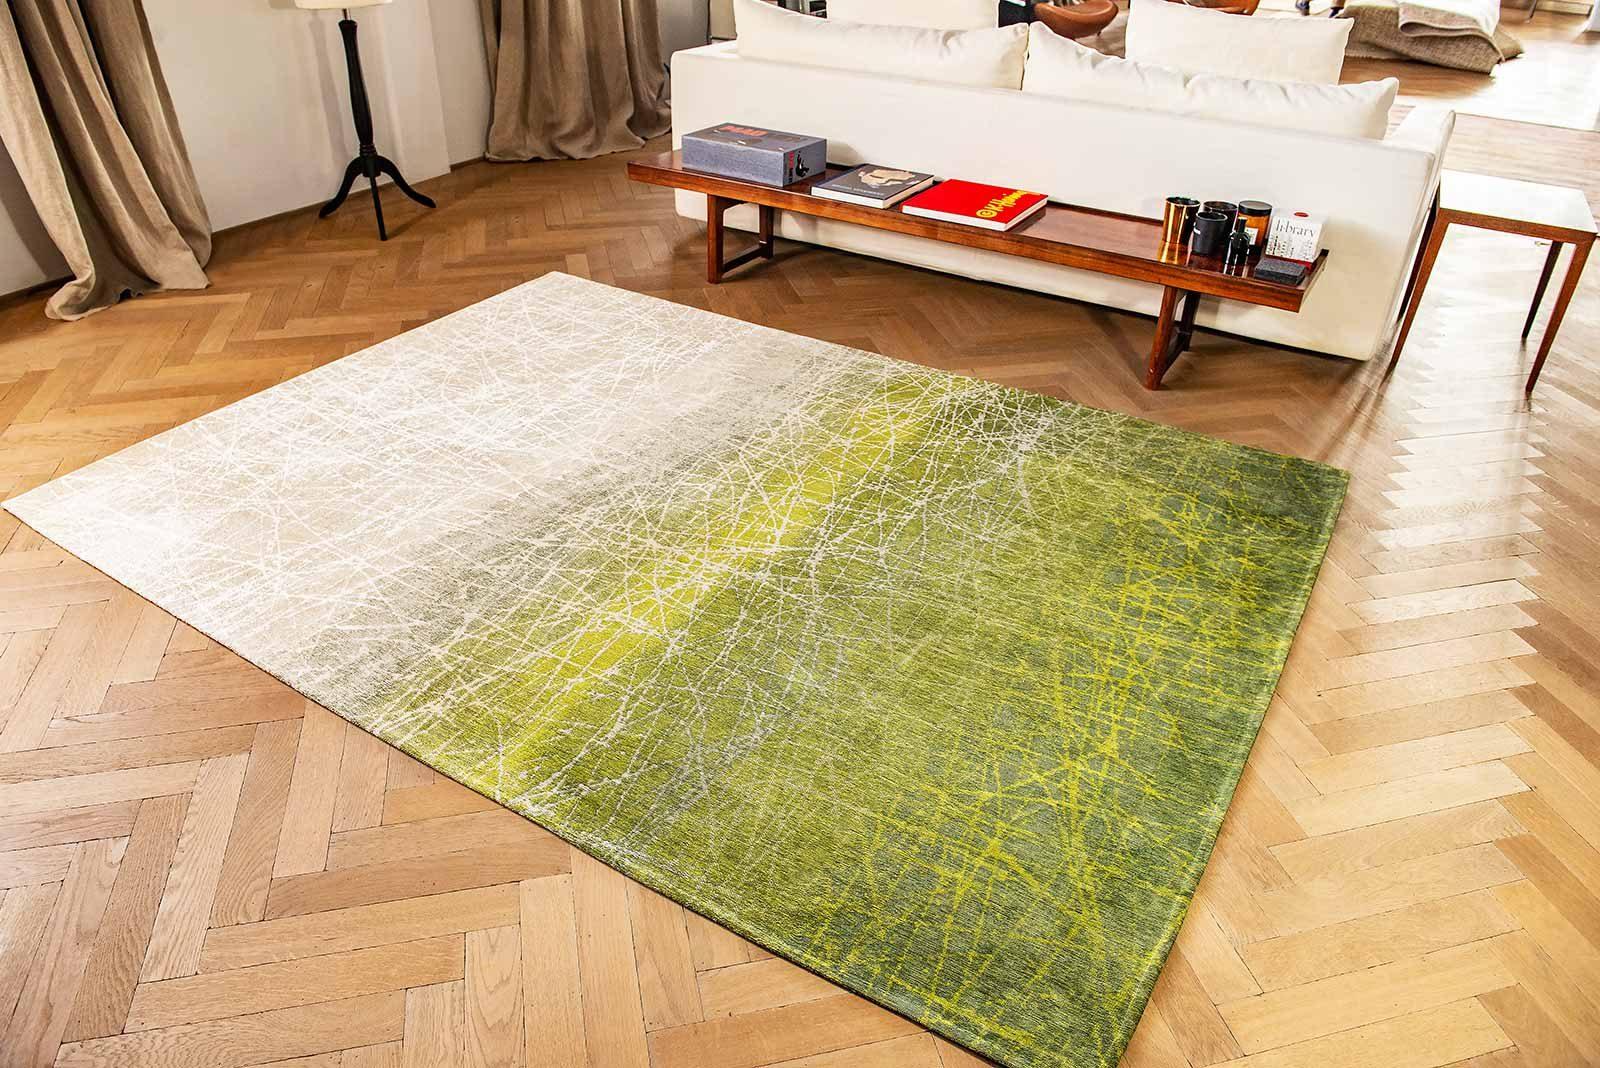 alfombras Louis De Poortere LX 8882 Mad Men Fahrenheit Central Park Green interior 2